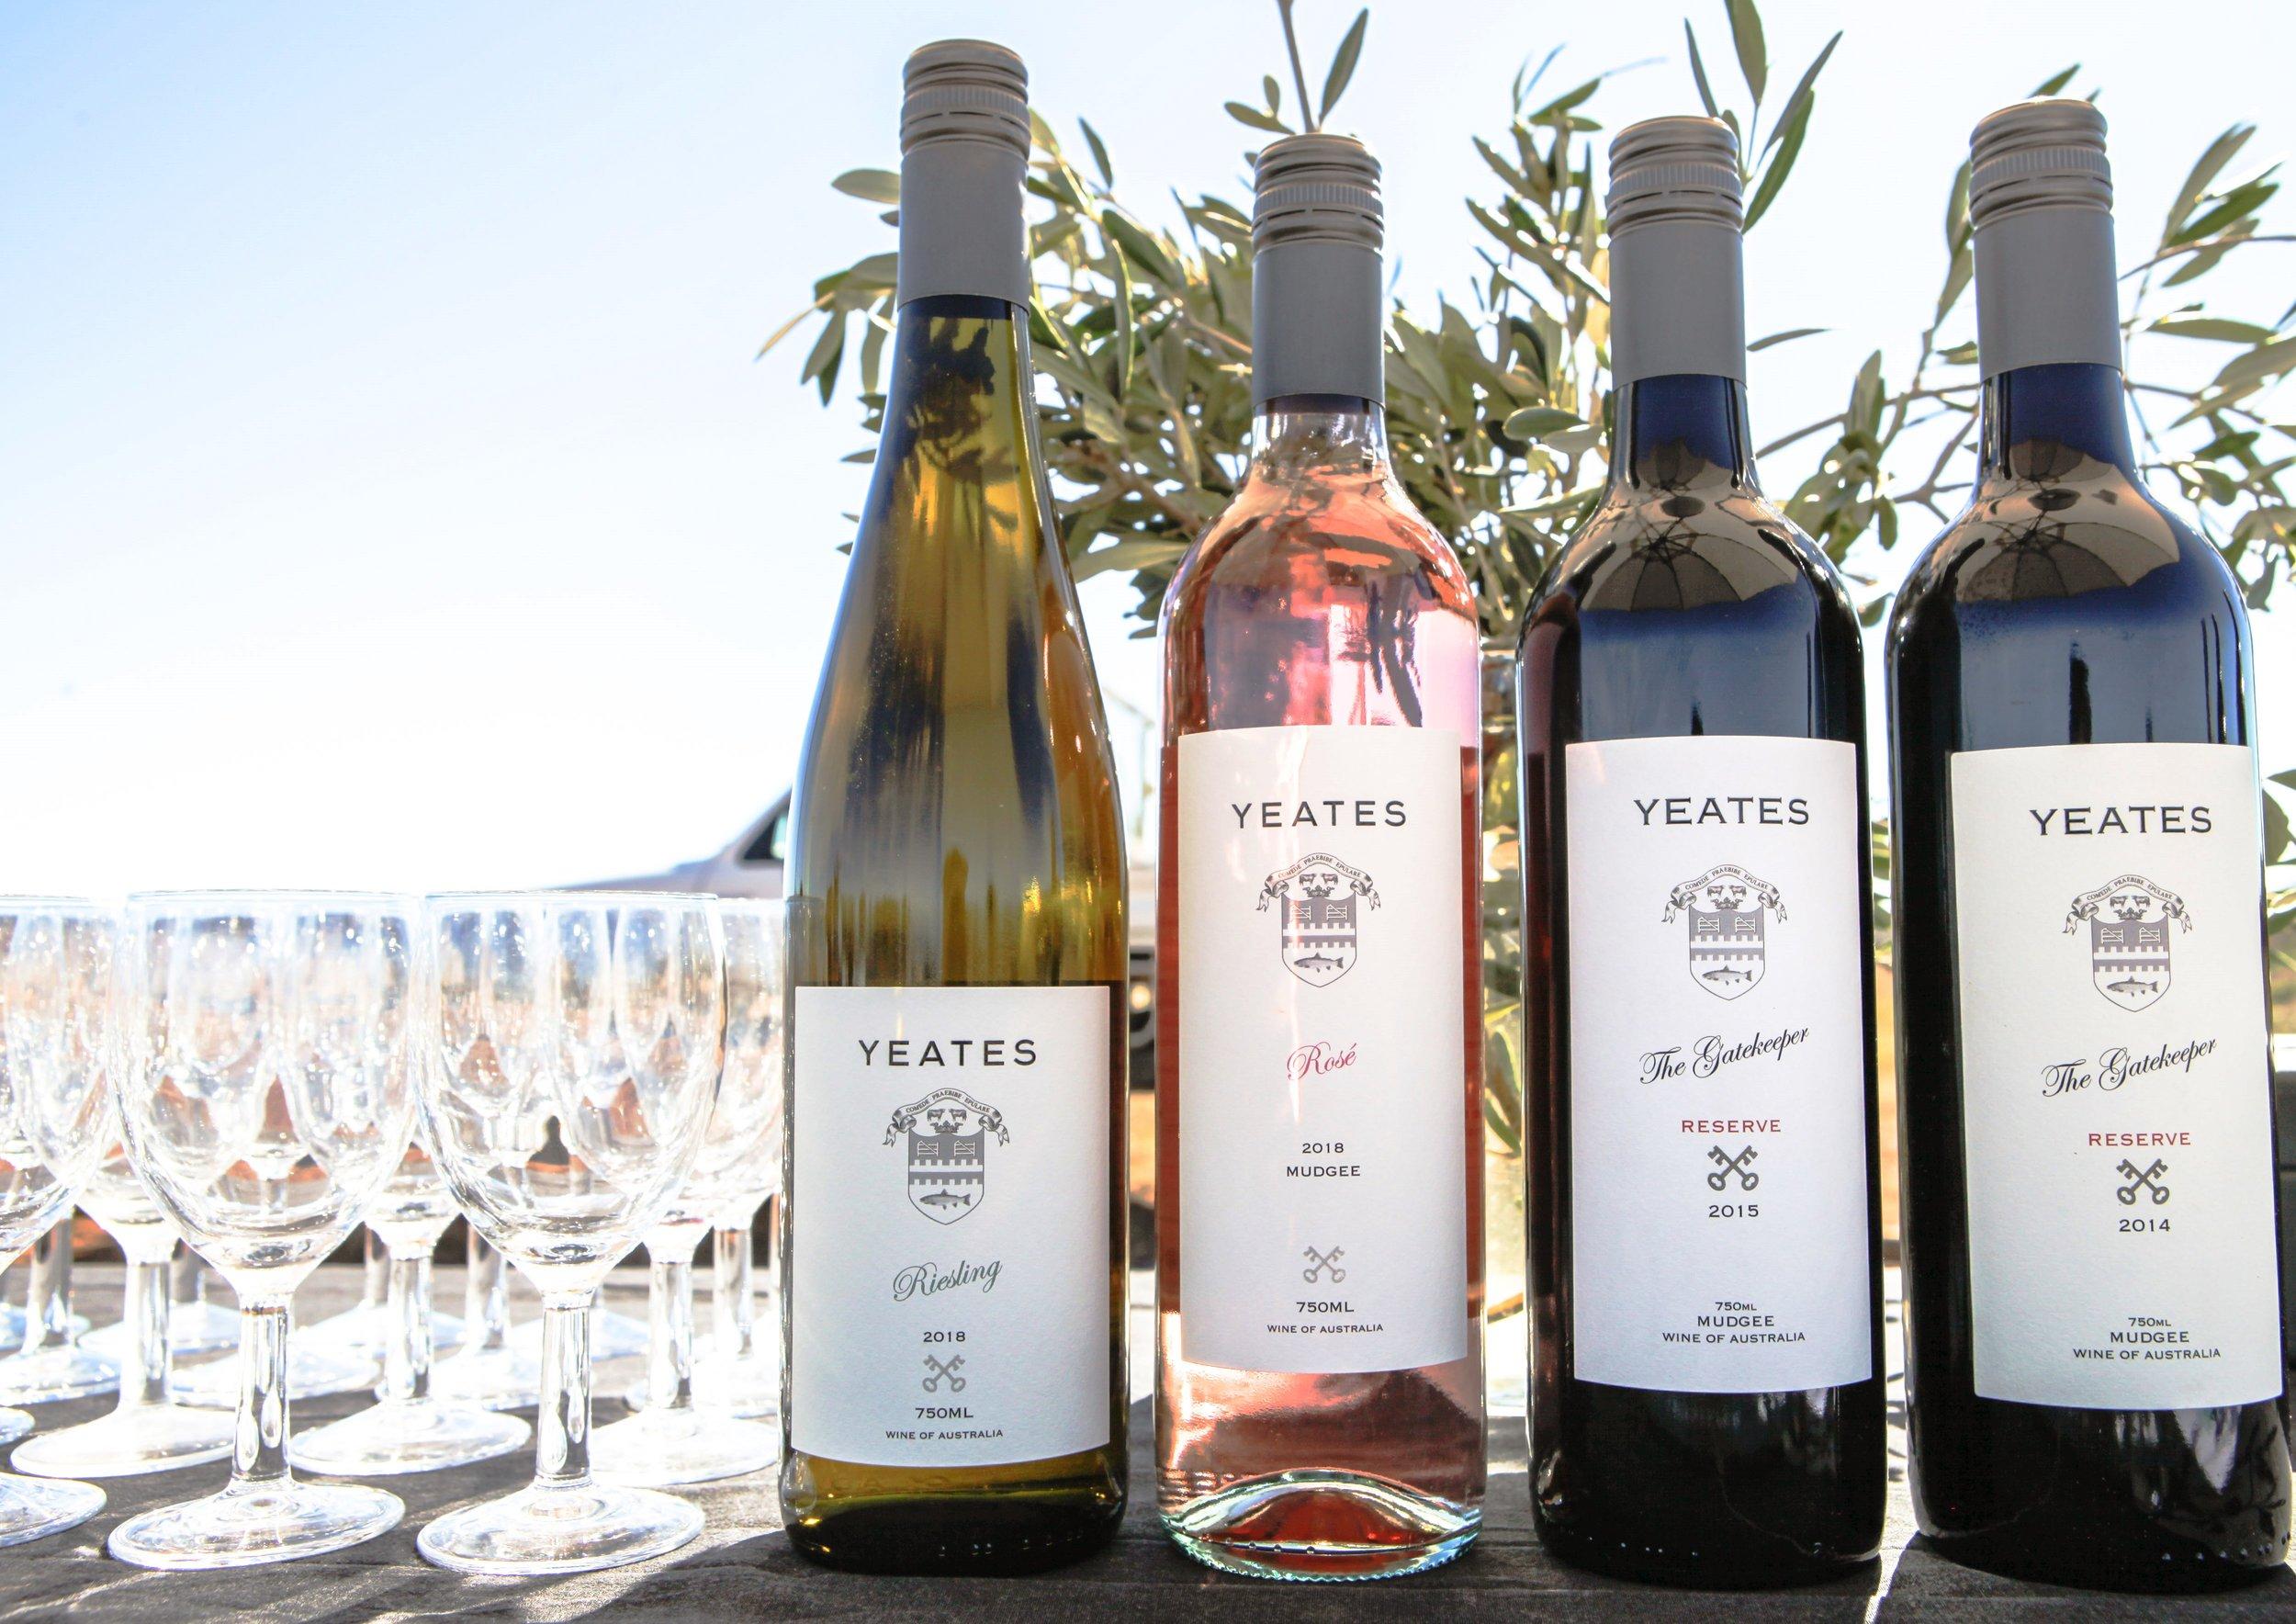 Visit My Farm Australia - Yeates Wines, Mudgee NSW